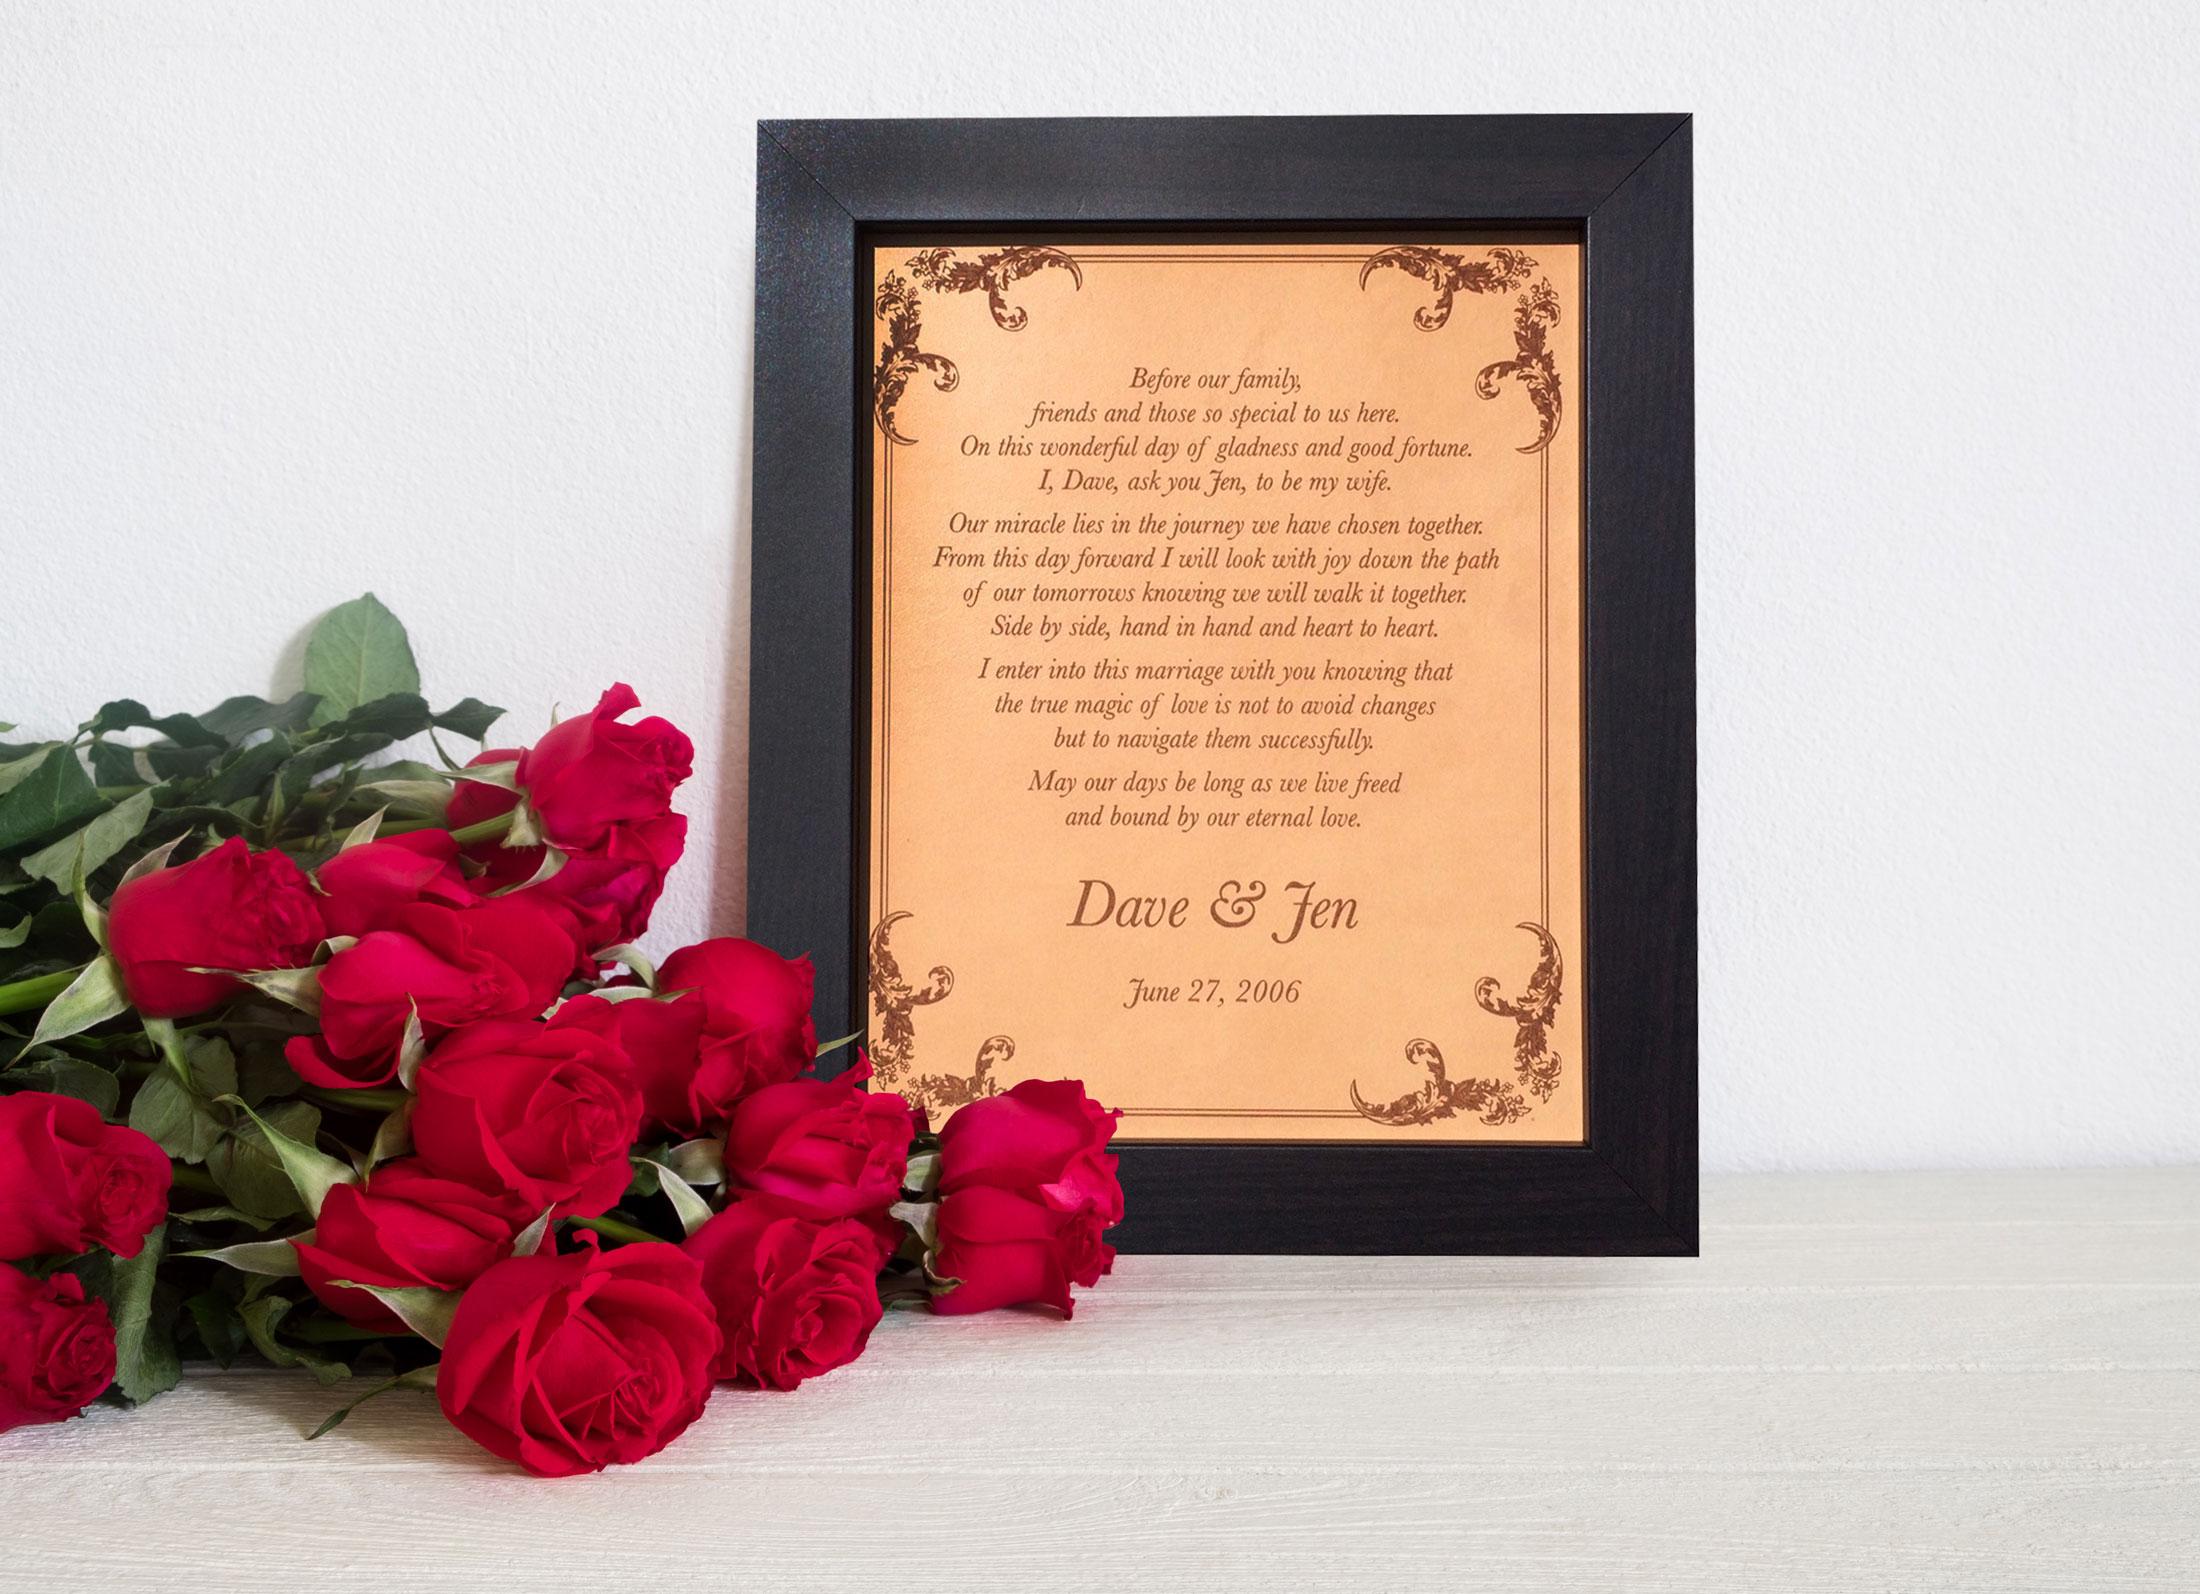 Romantic Wedding Vows.Wedding Vows Keepsake Leather Gift